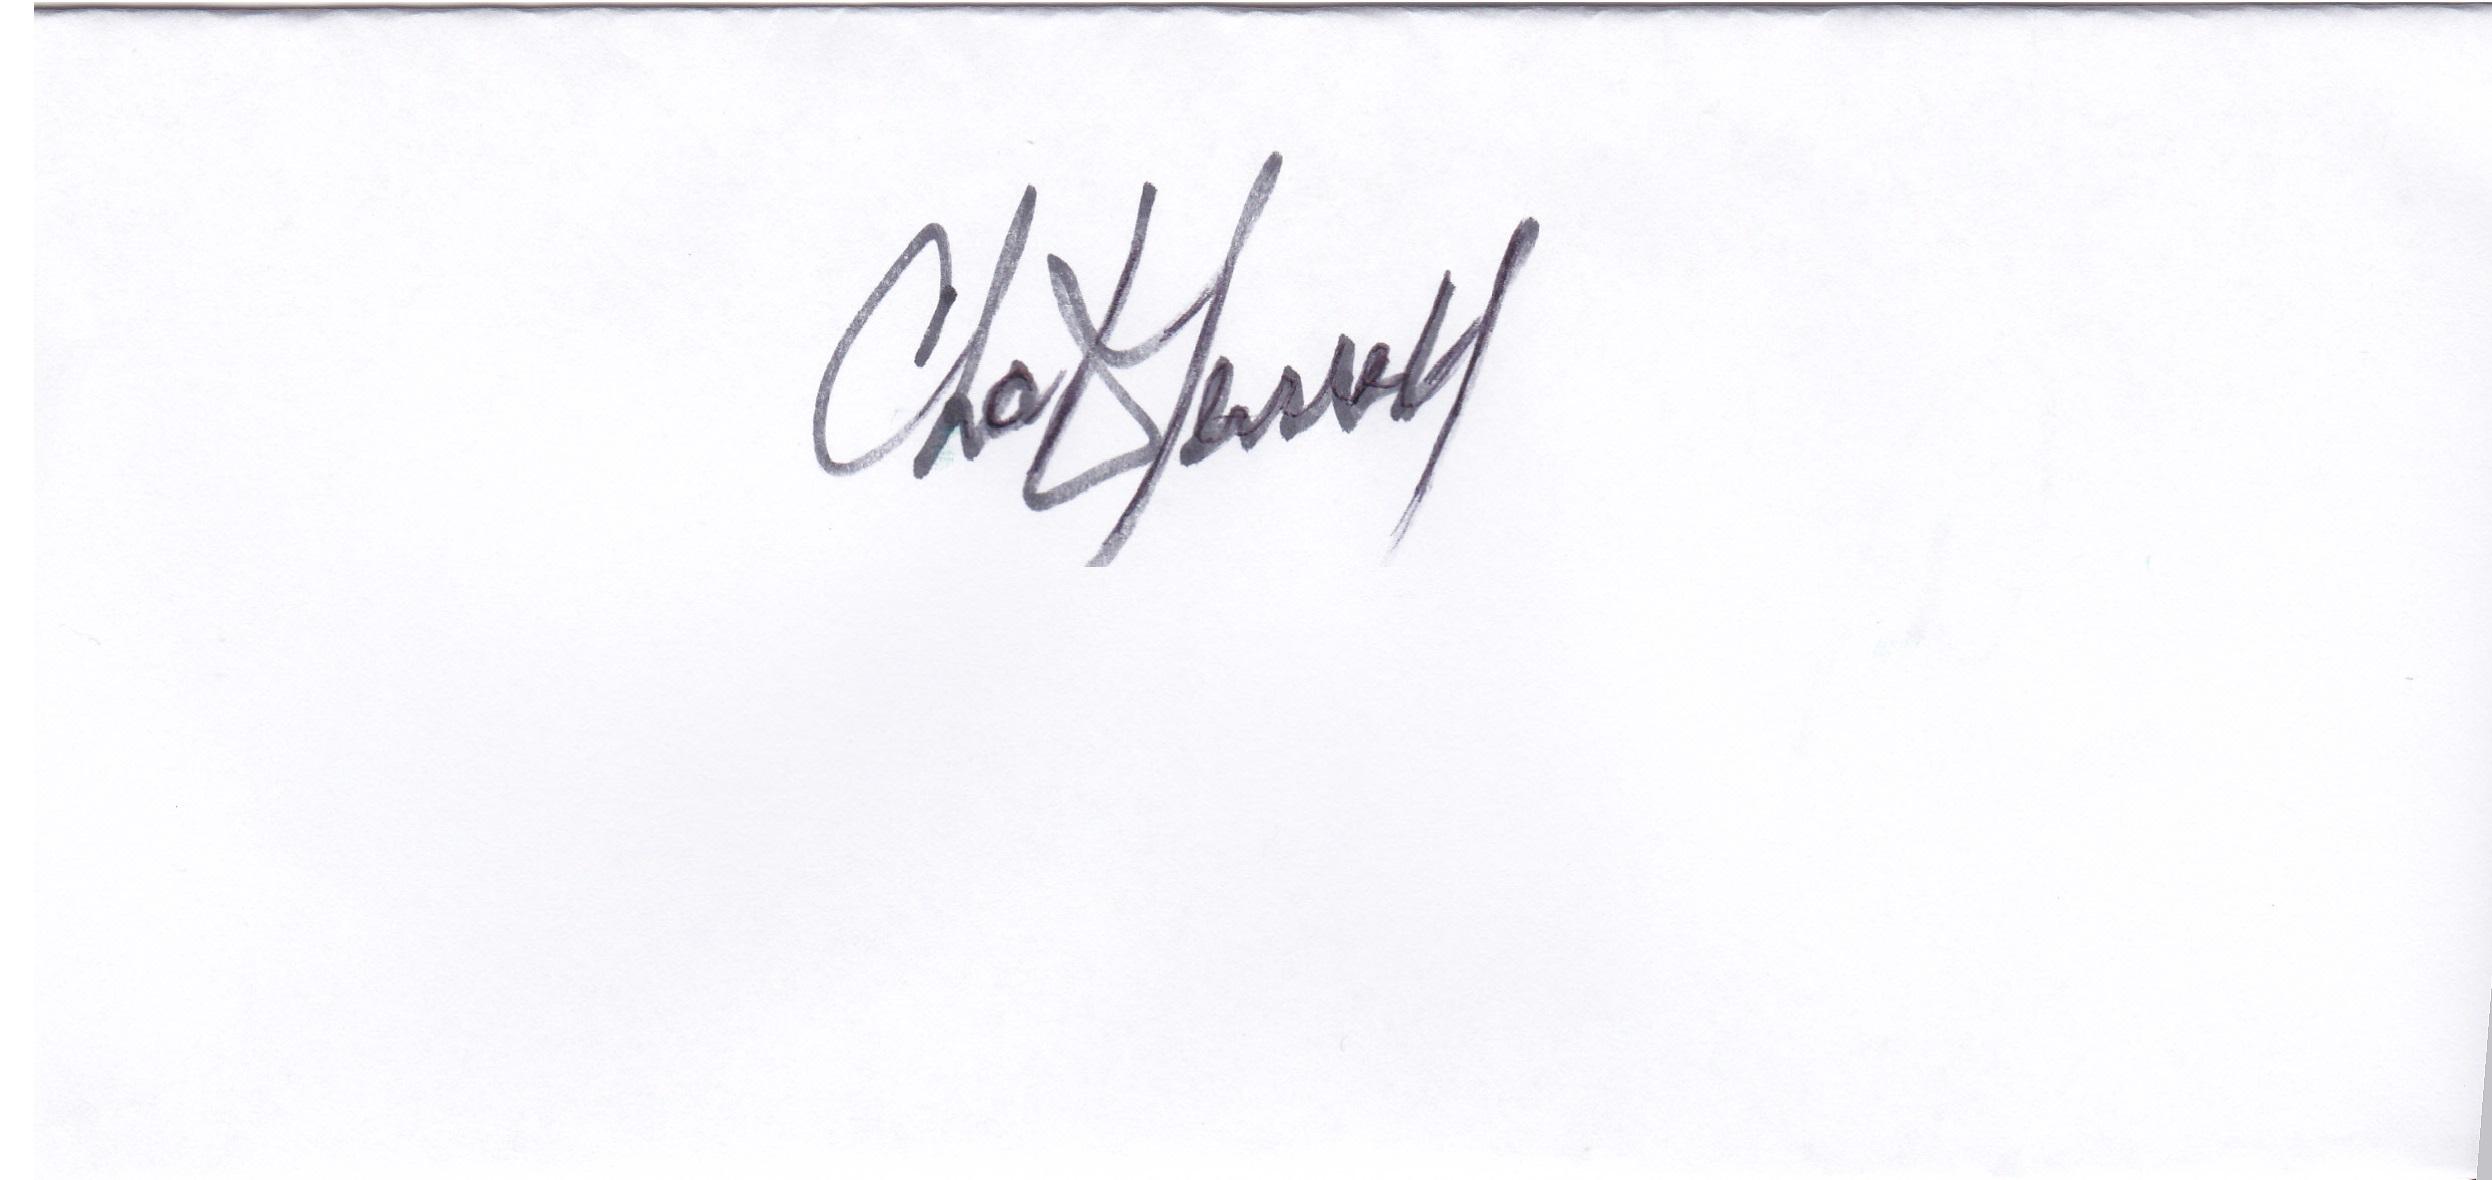 Chuck Terrell Signature